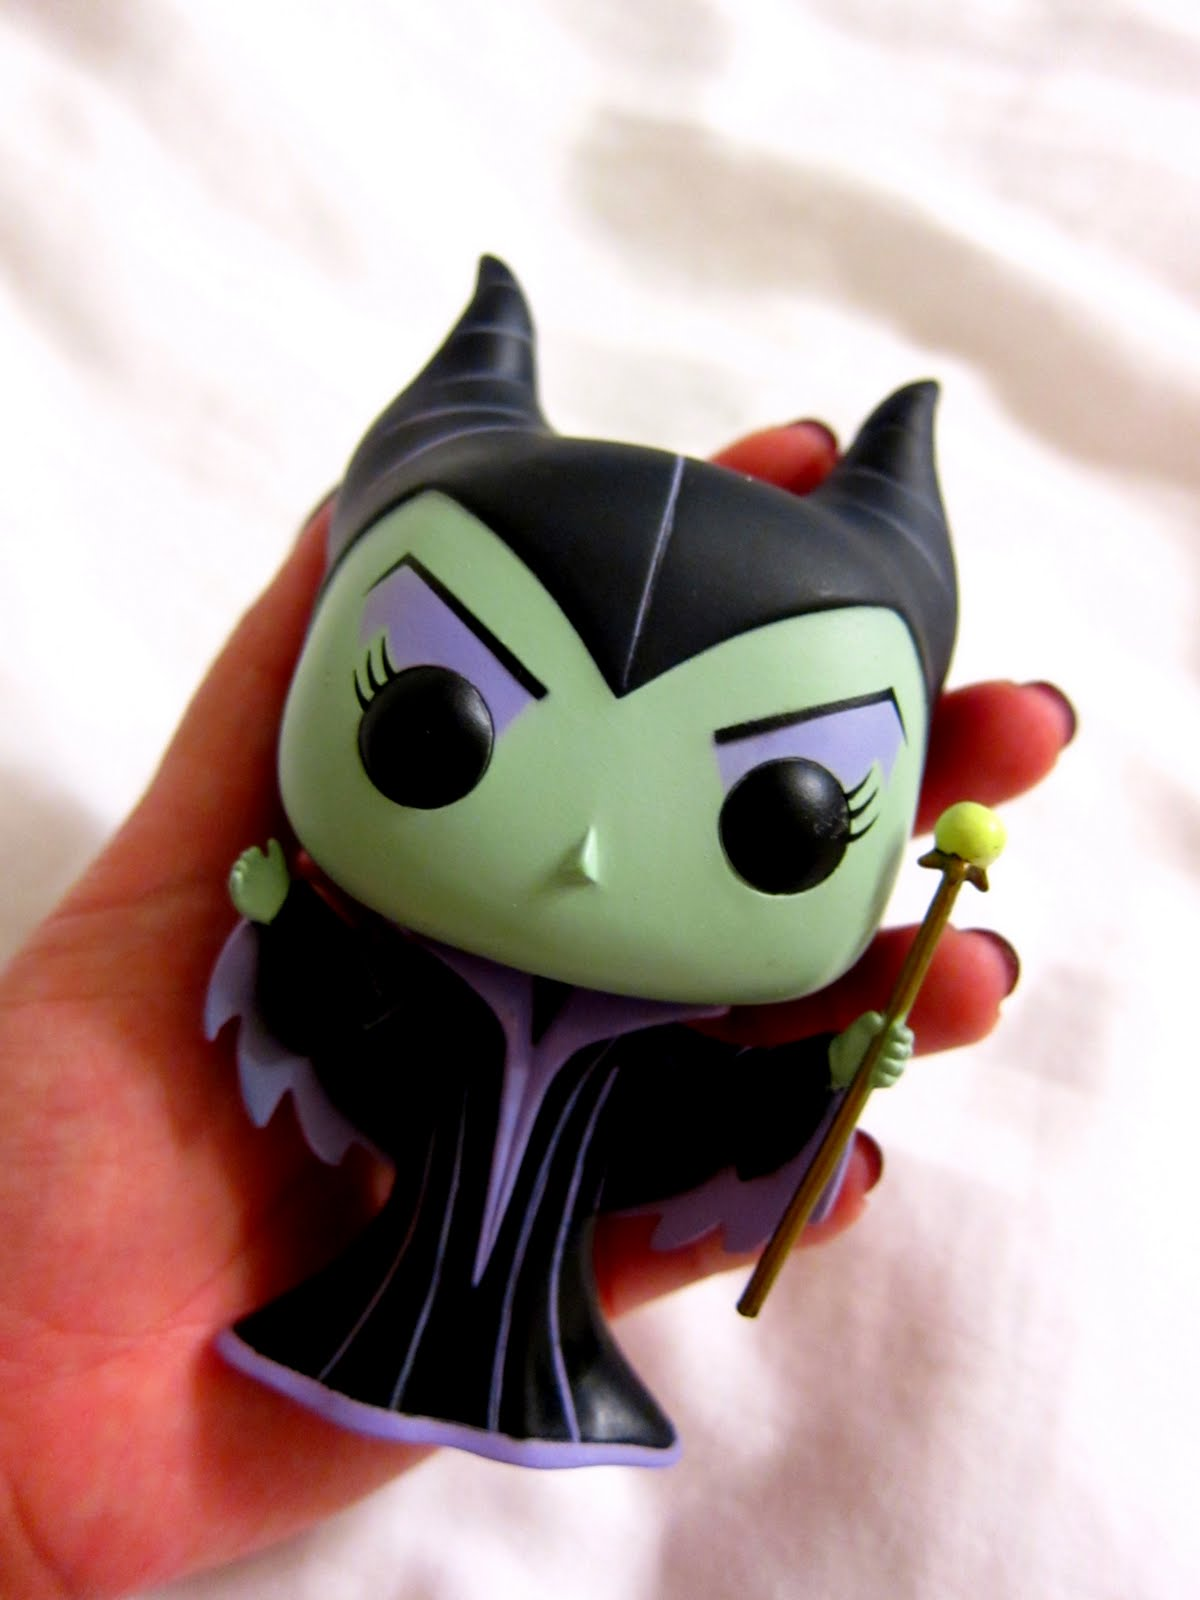 Cutetastic Disney Finds Disney Pop By Funko Maleficent